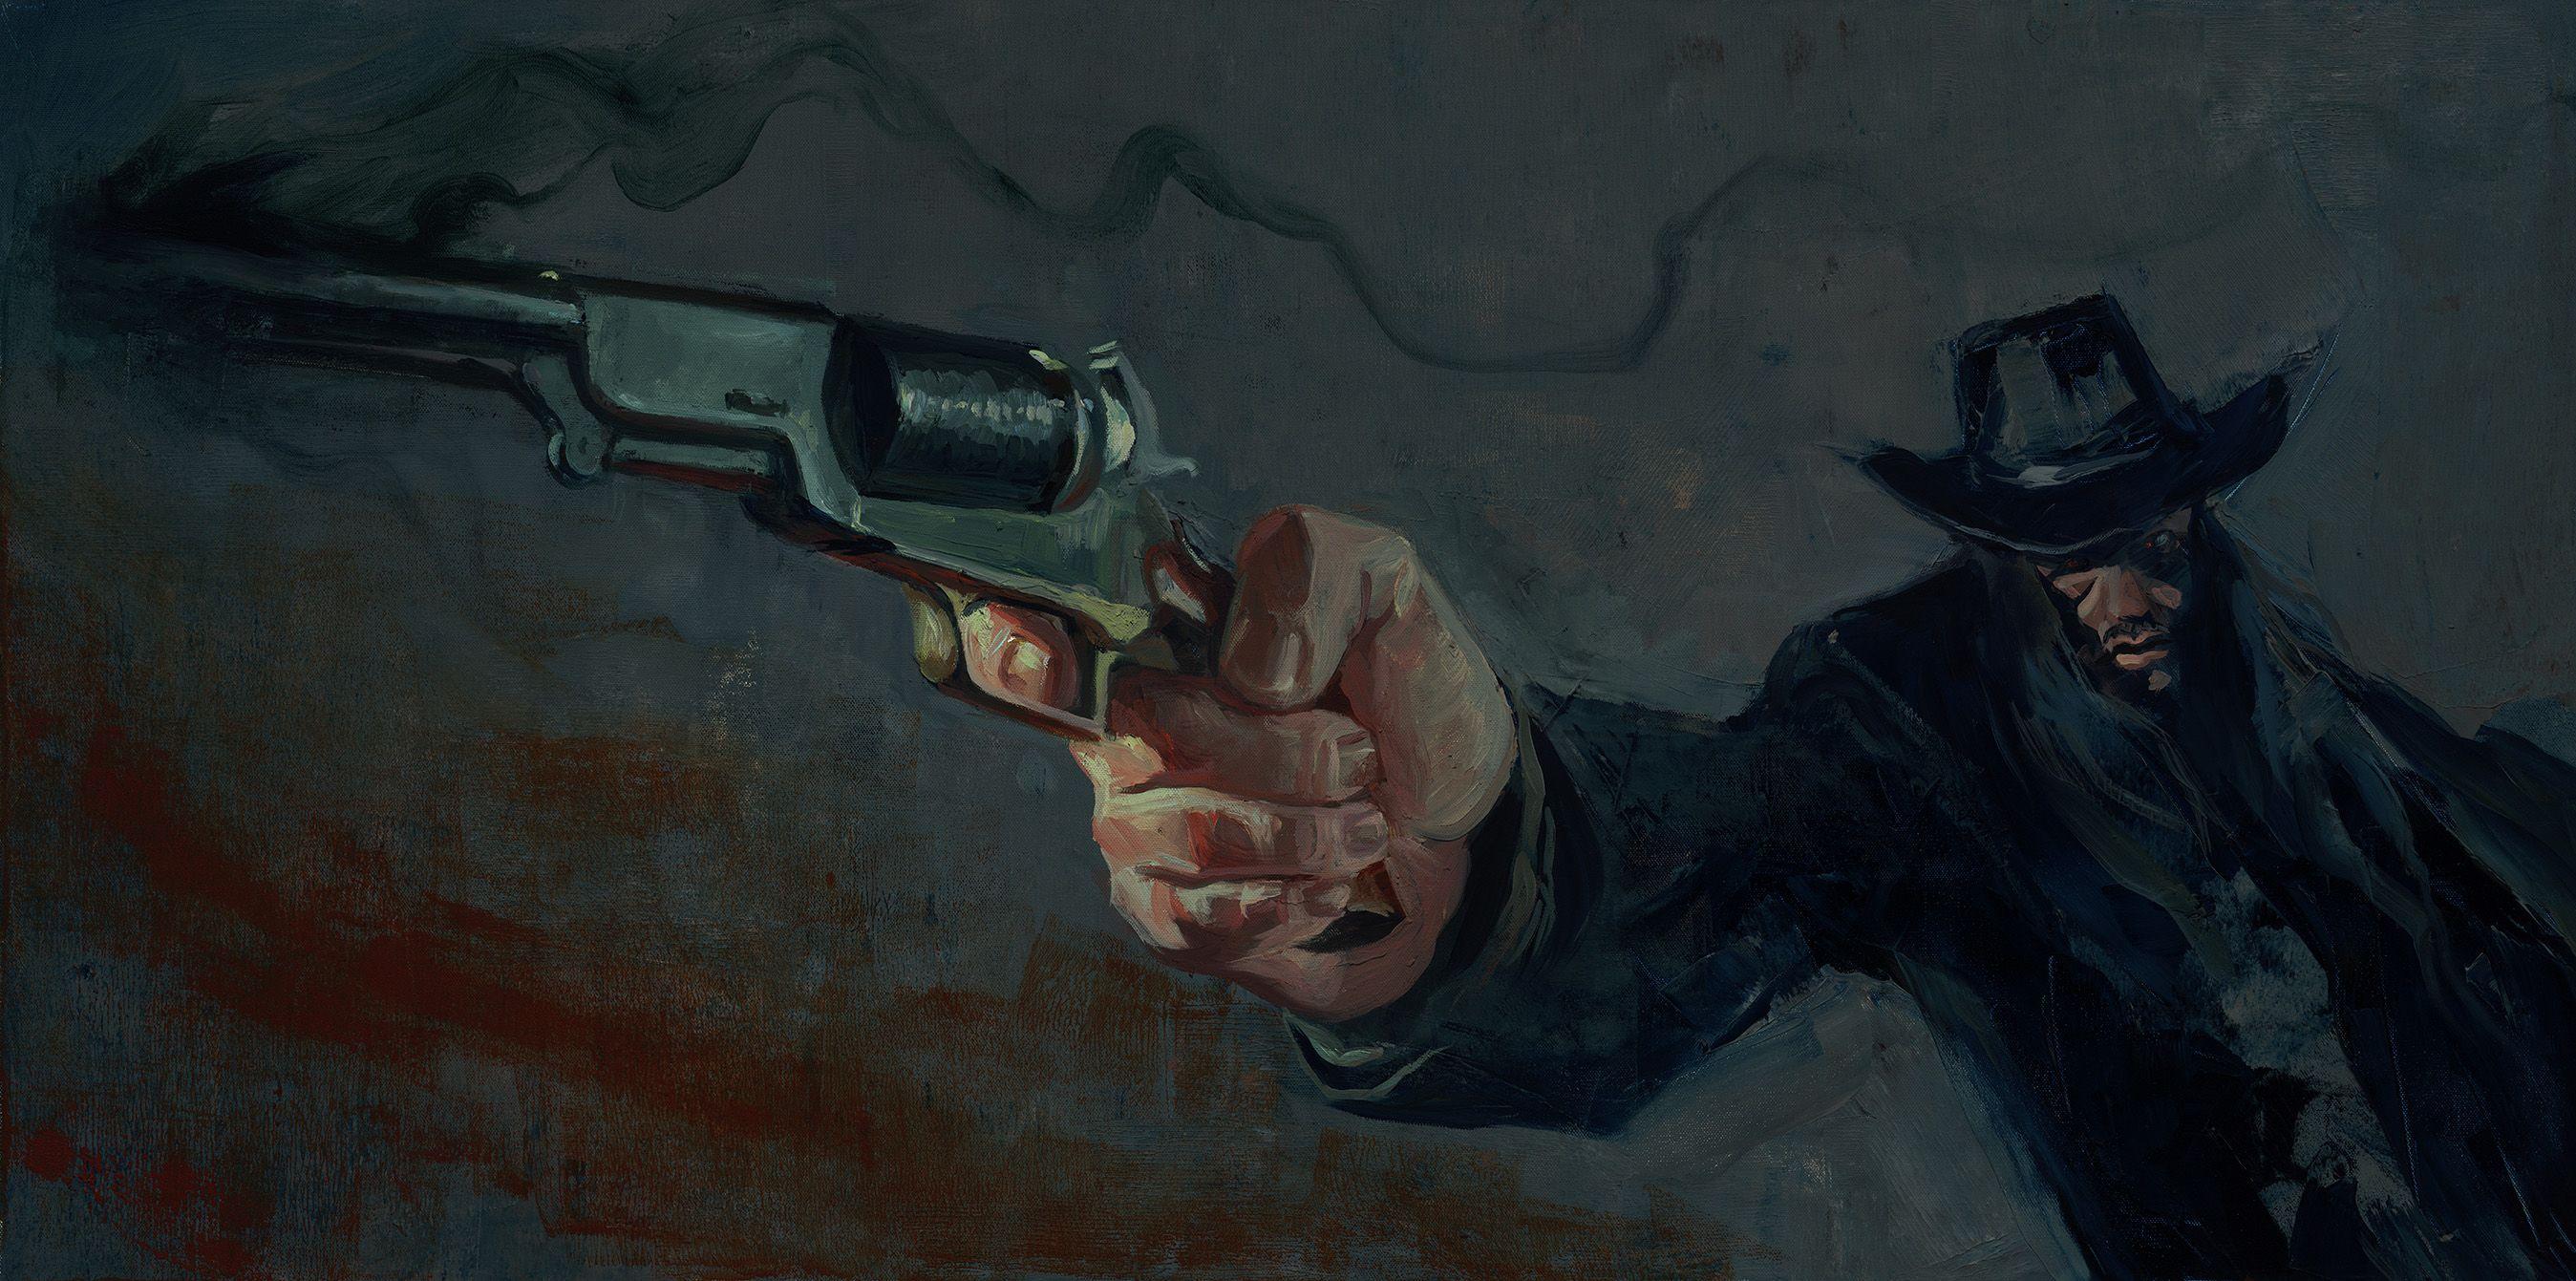 Gabe Leonard - The desperados http://kentuckymonamour.blogspot.it/2015/03/illustrators-illustrations-gabe-leonard.html #art #artist #western #westernart #painting #shootouts #GabeLeonard #TheDesperados